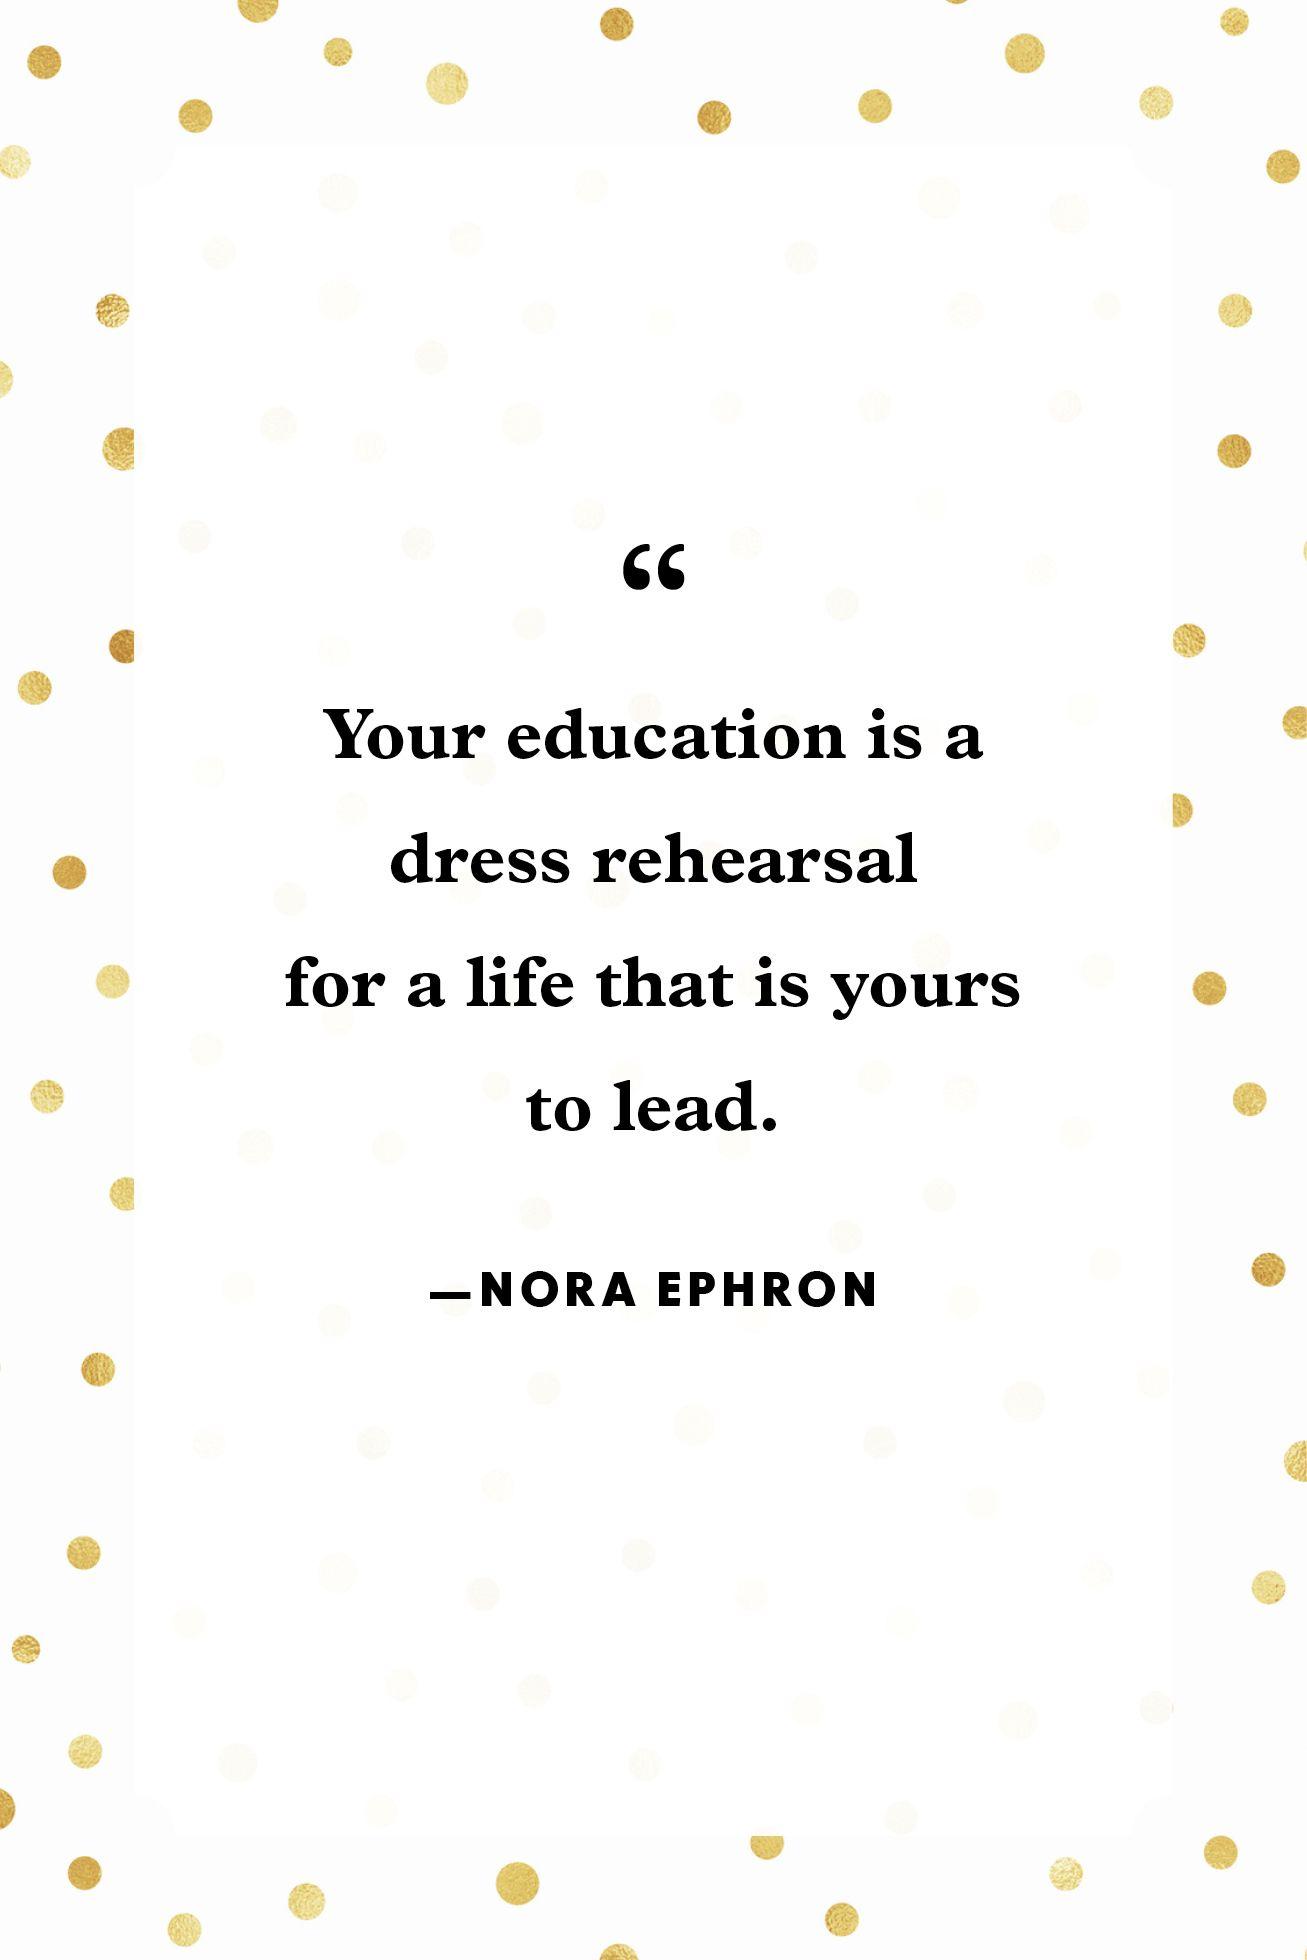 12 Graduation Quotes - Inspirational Quotes for Recent Grads